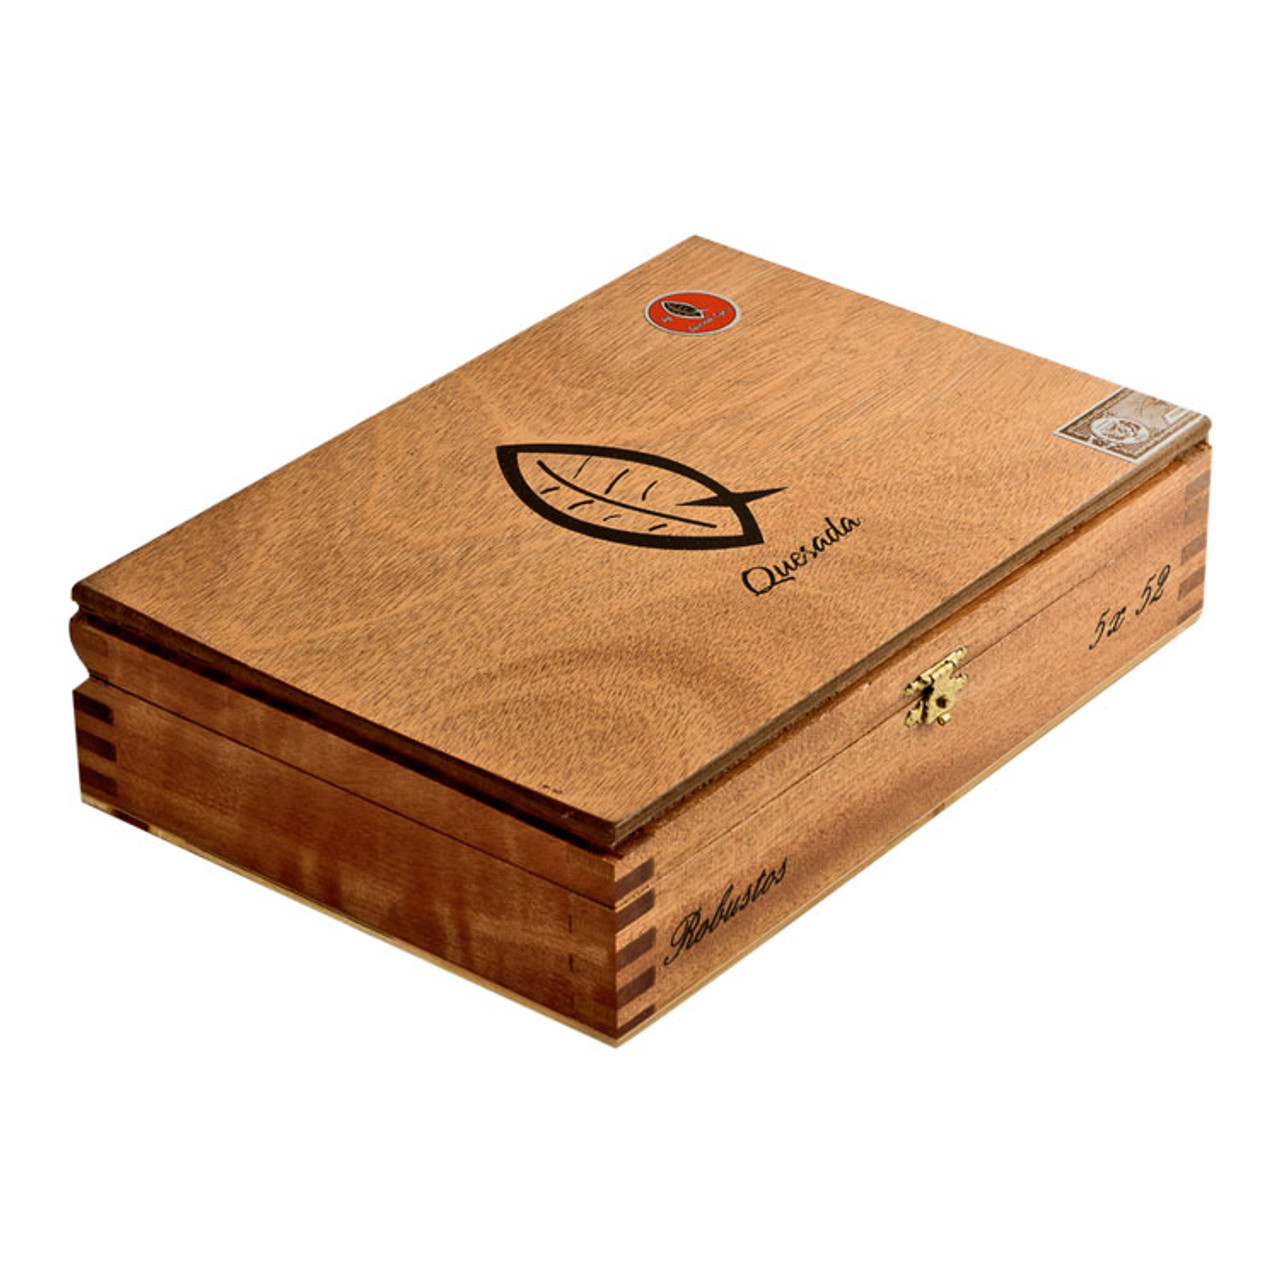 Quesada Espana Corona Cigars - 5.5 x 42 (Box of 20)